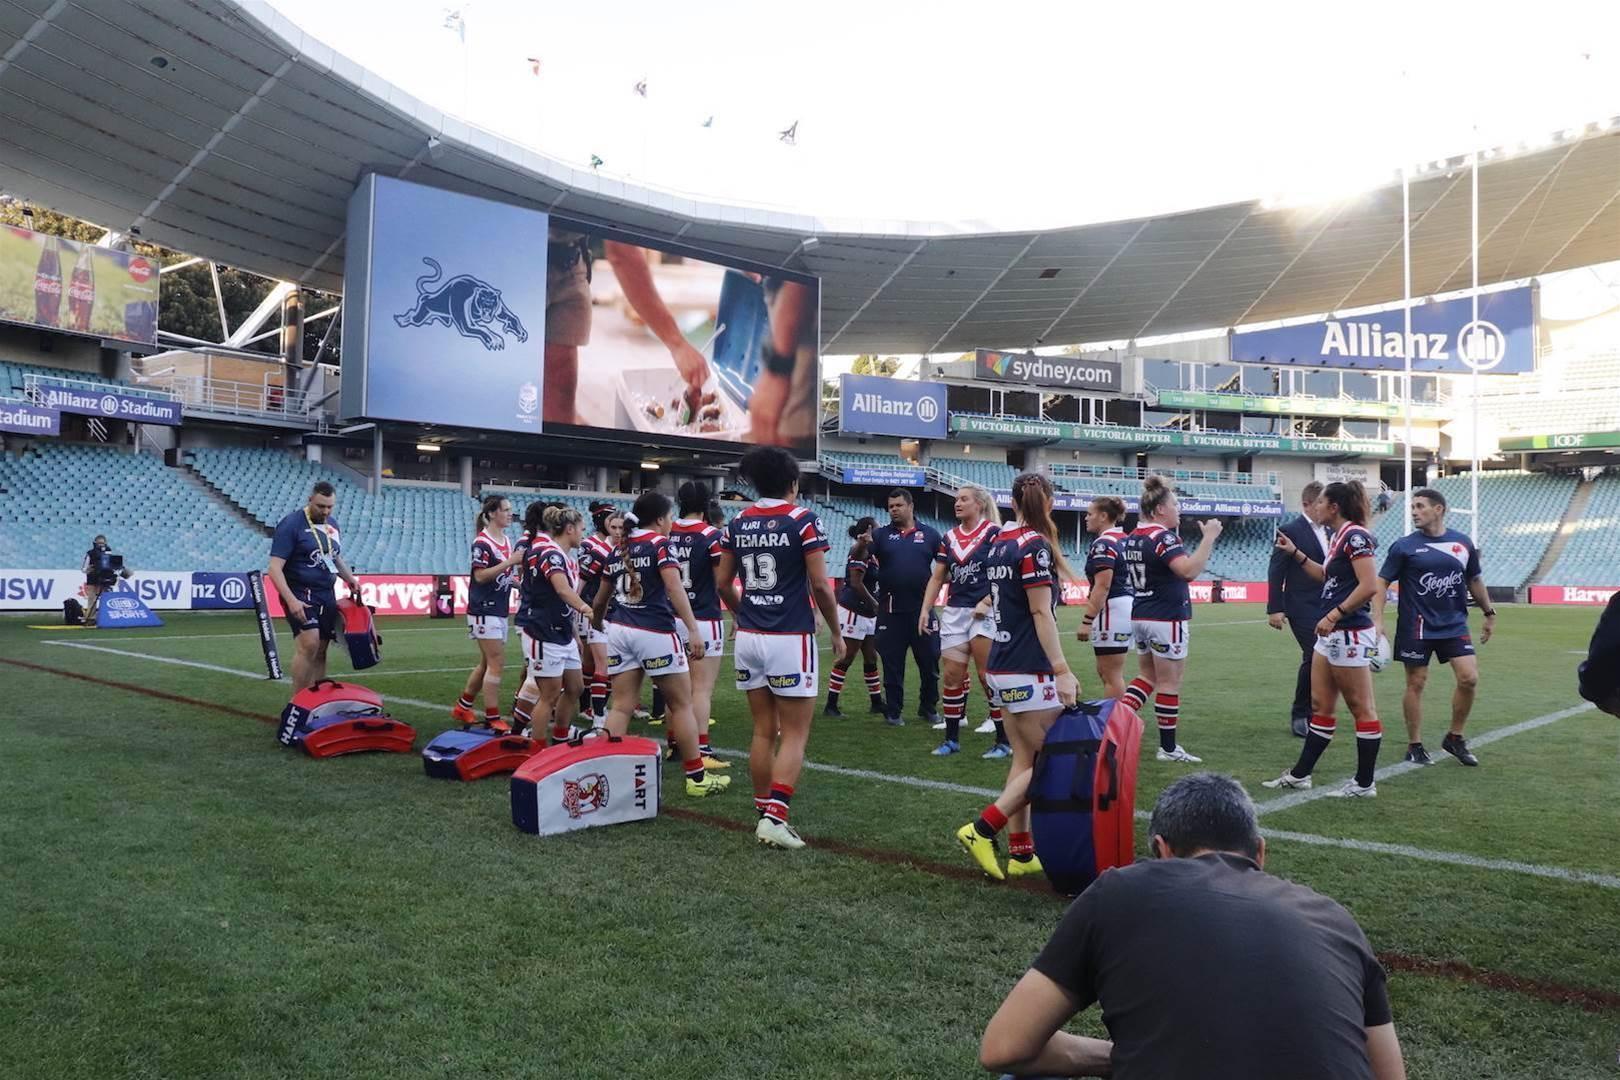 The Sydney Football Stadium's last hurrah